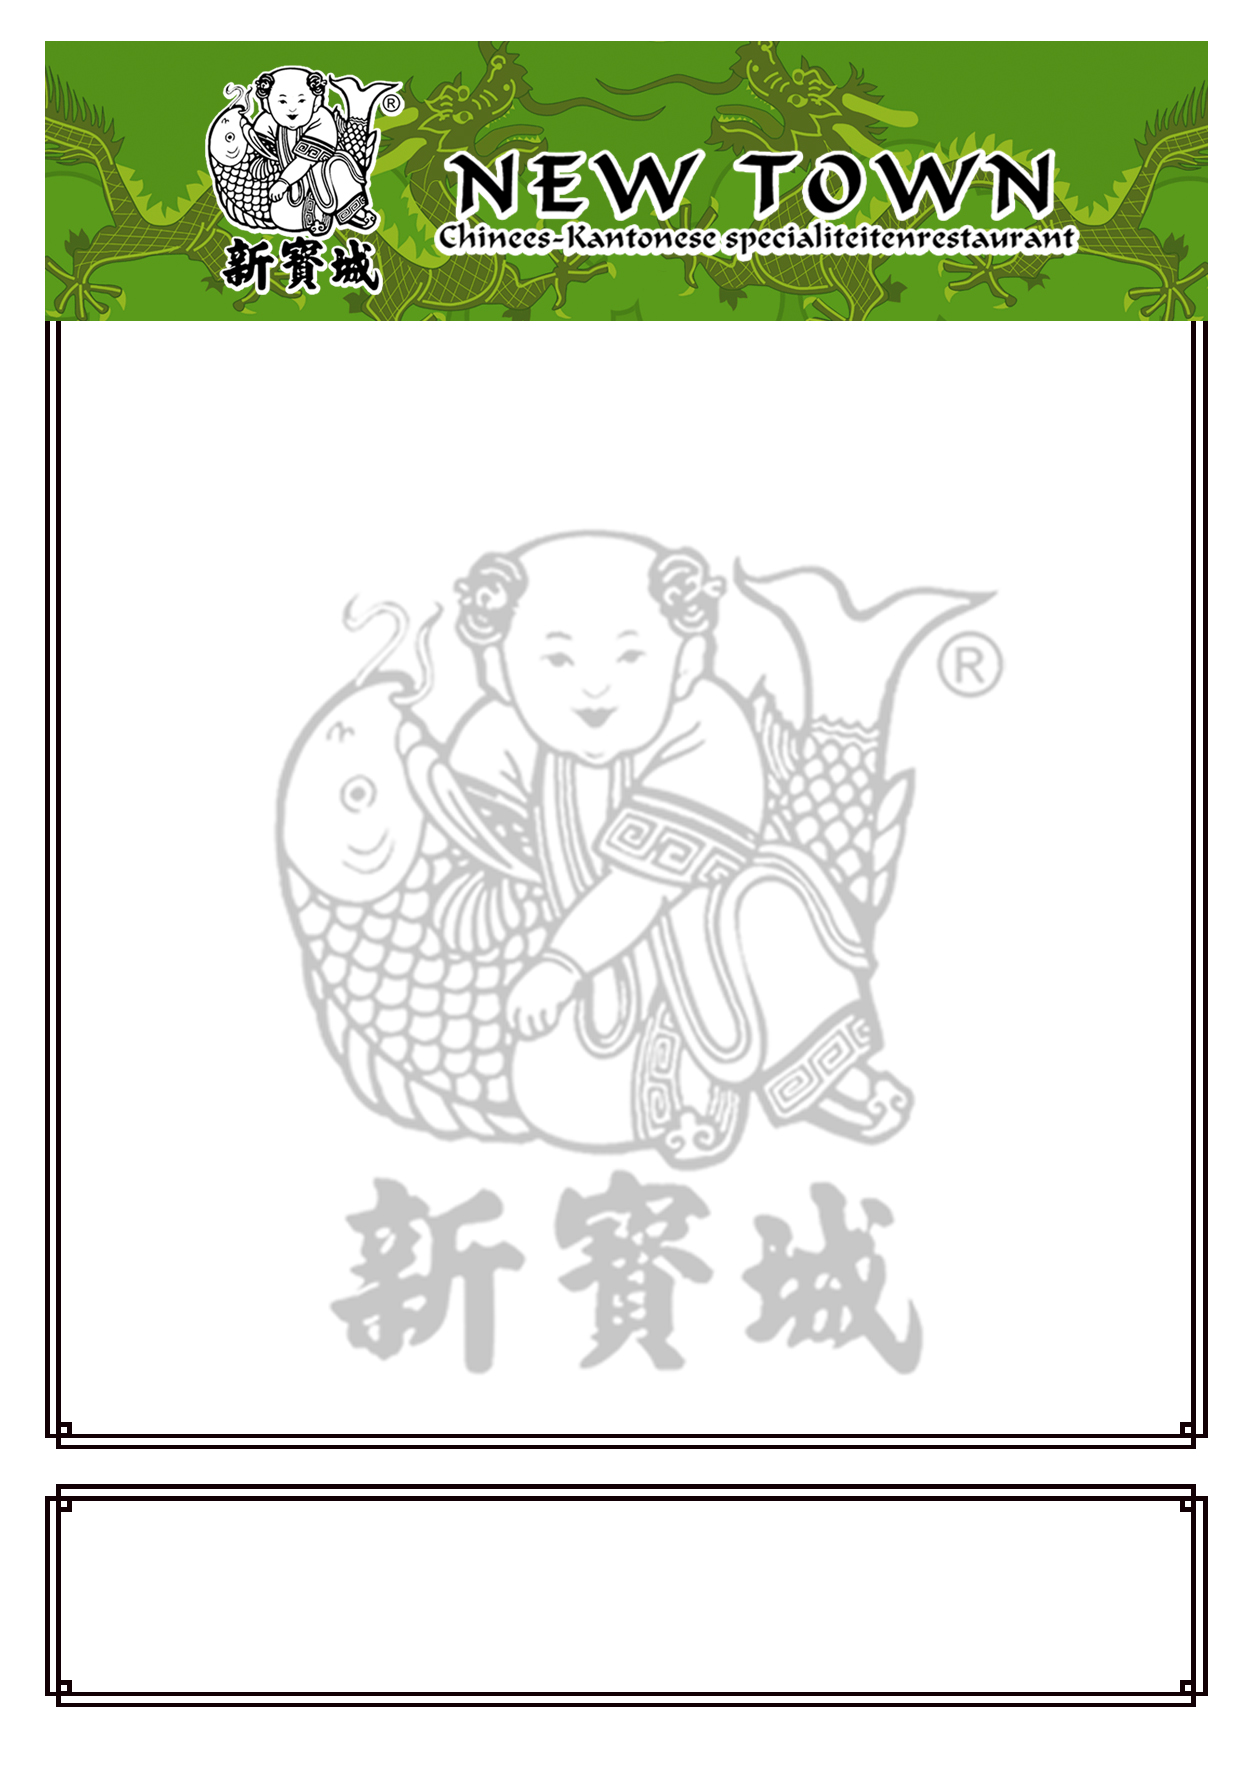 menu3-green